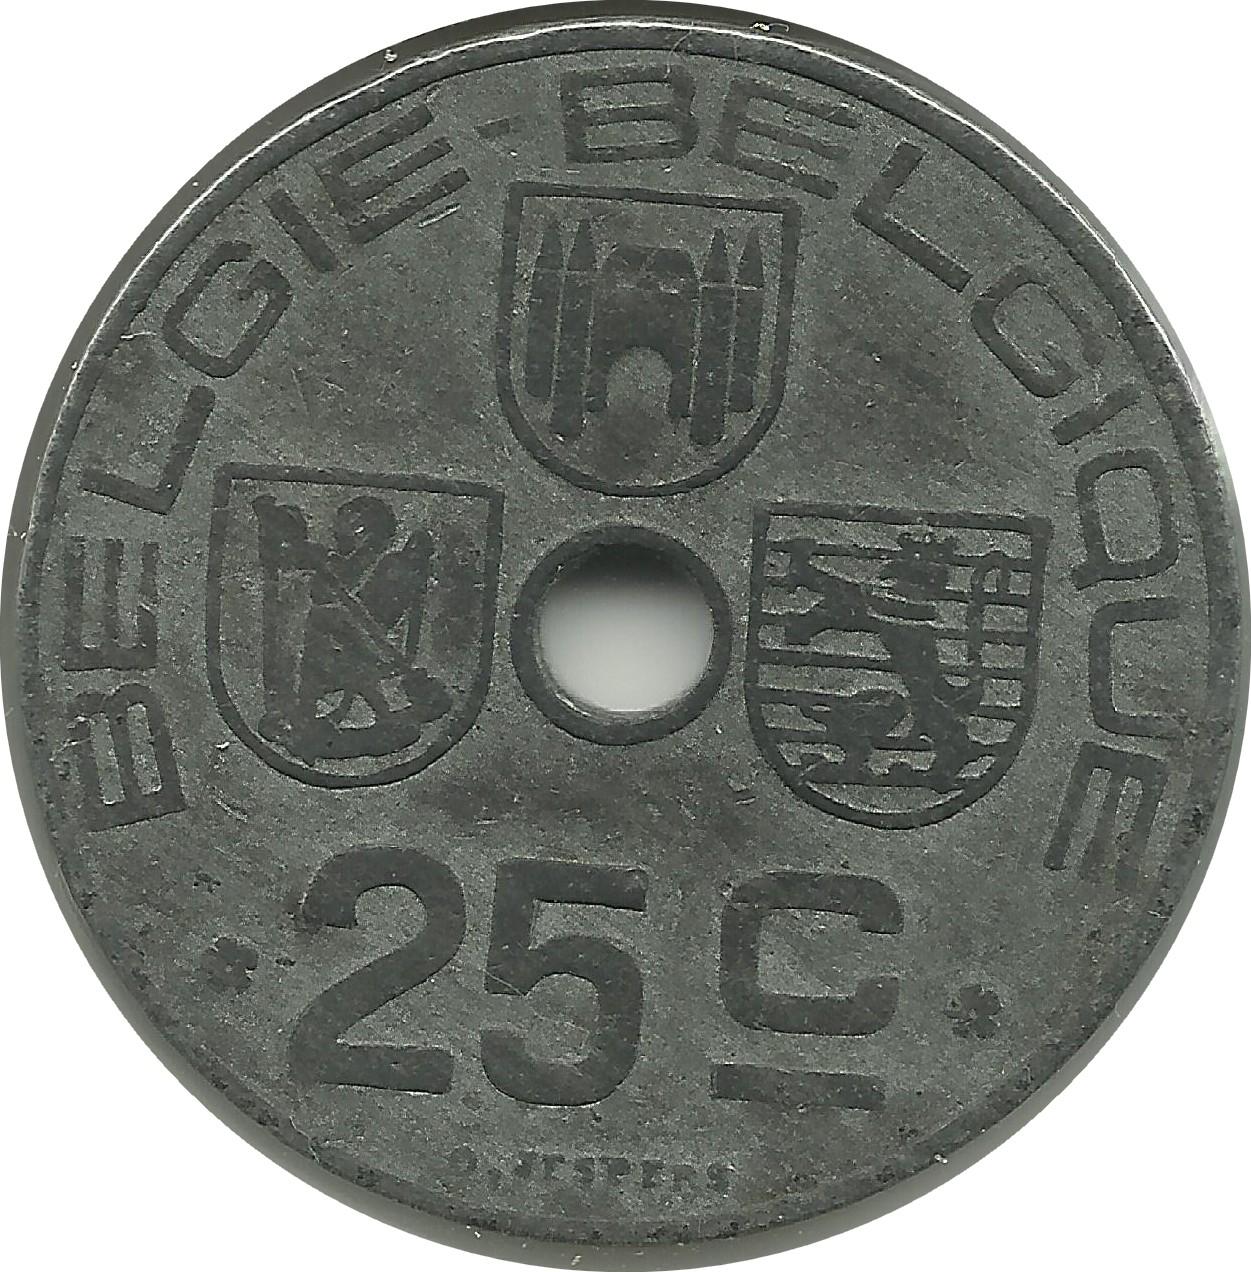 25 centimes - l u00e9opold iii  belgie-belgique